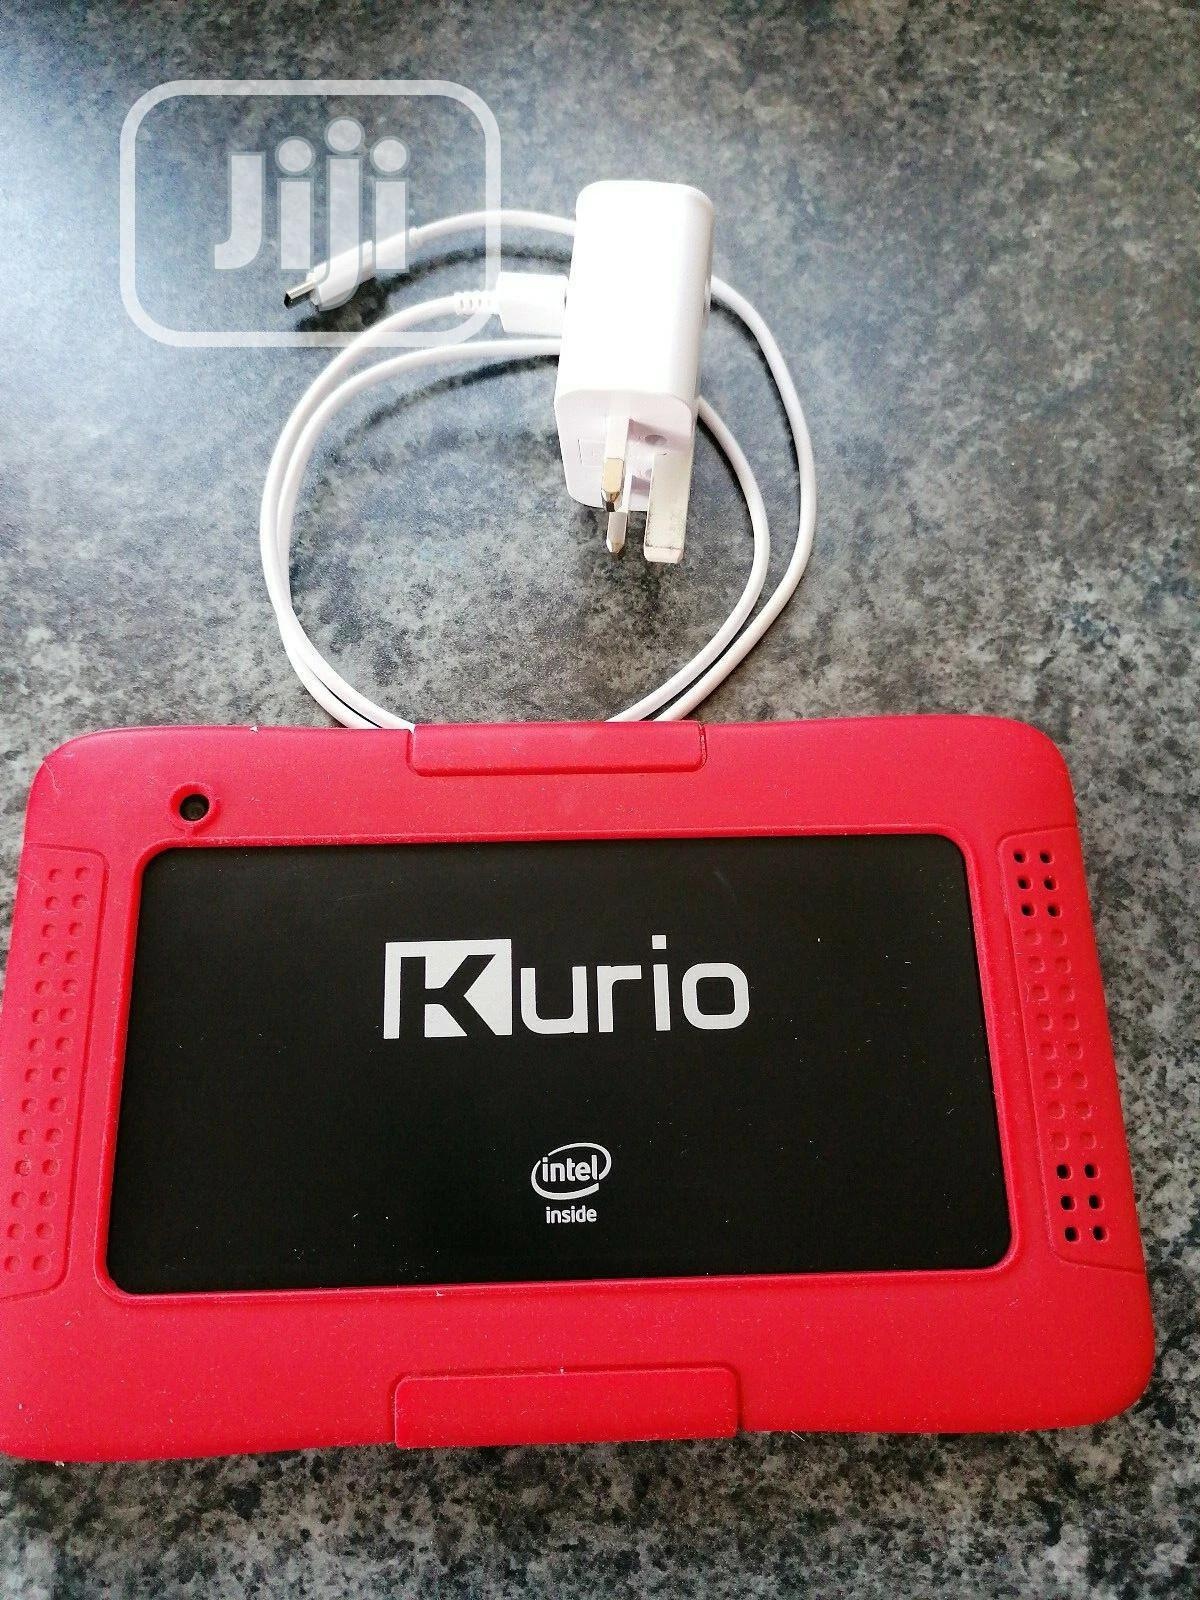 Kurio Next 16 GB Black | Tablets for sale in Amuwo-Odofin, Lagos State, Nigeria